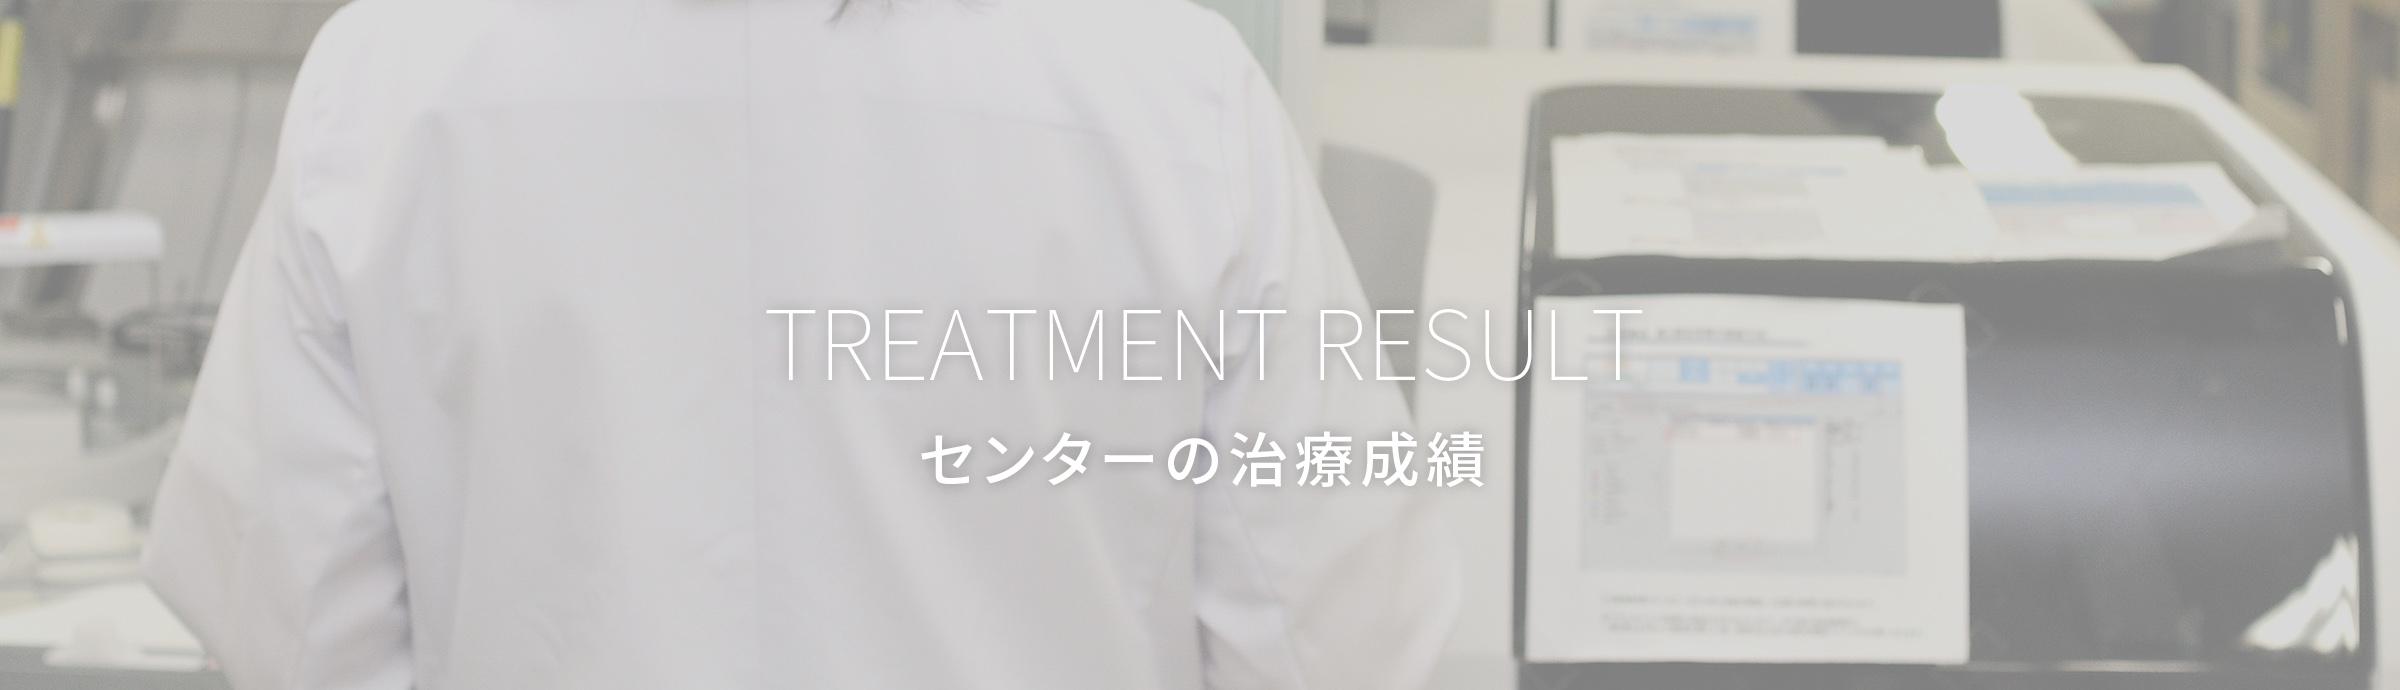 TREATMENT RESULT センターの治療成績